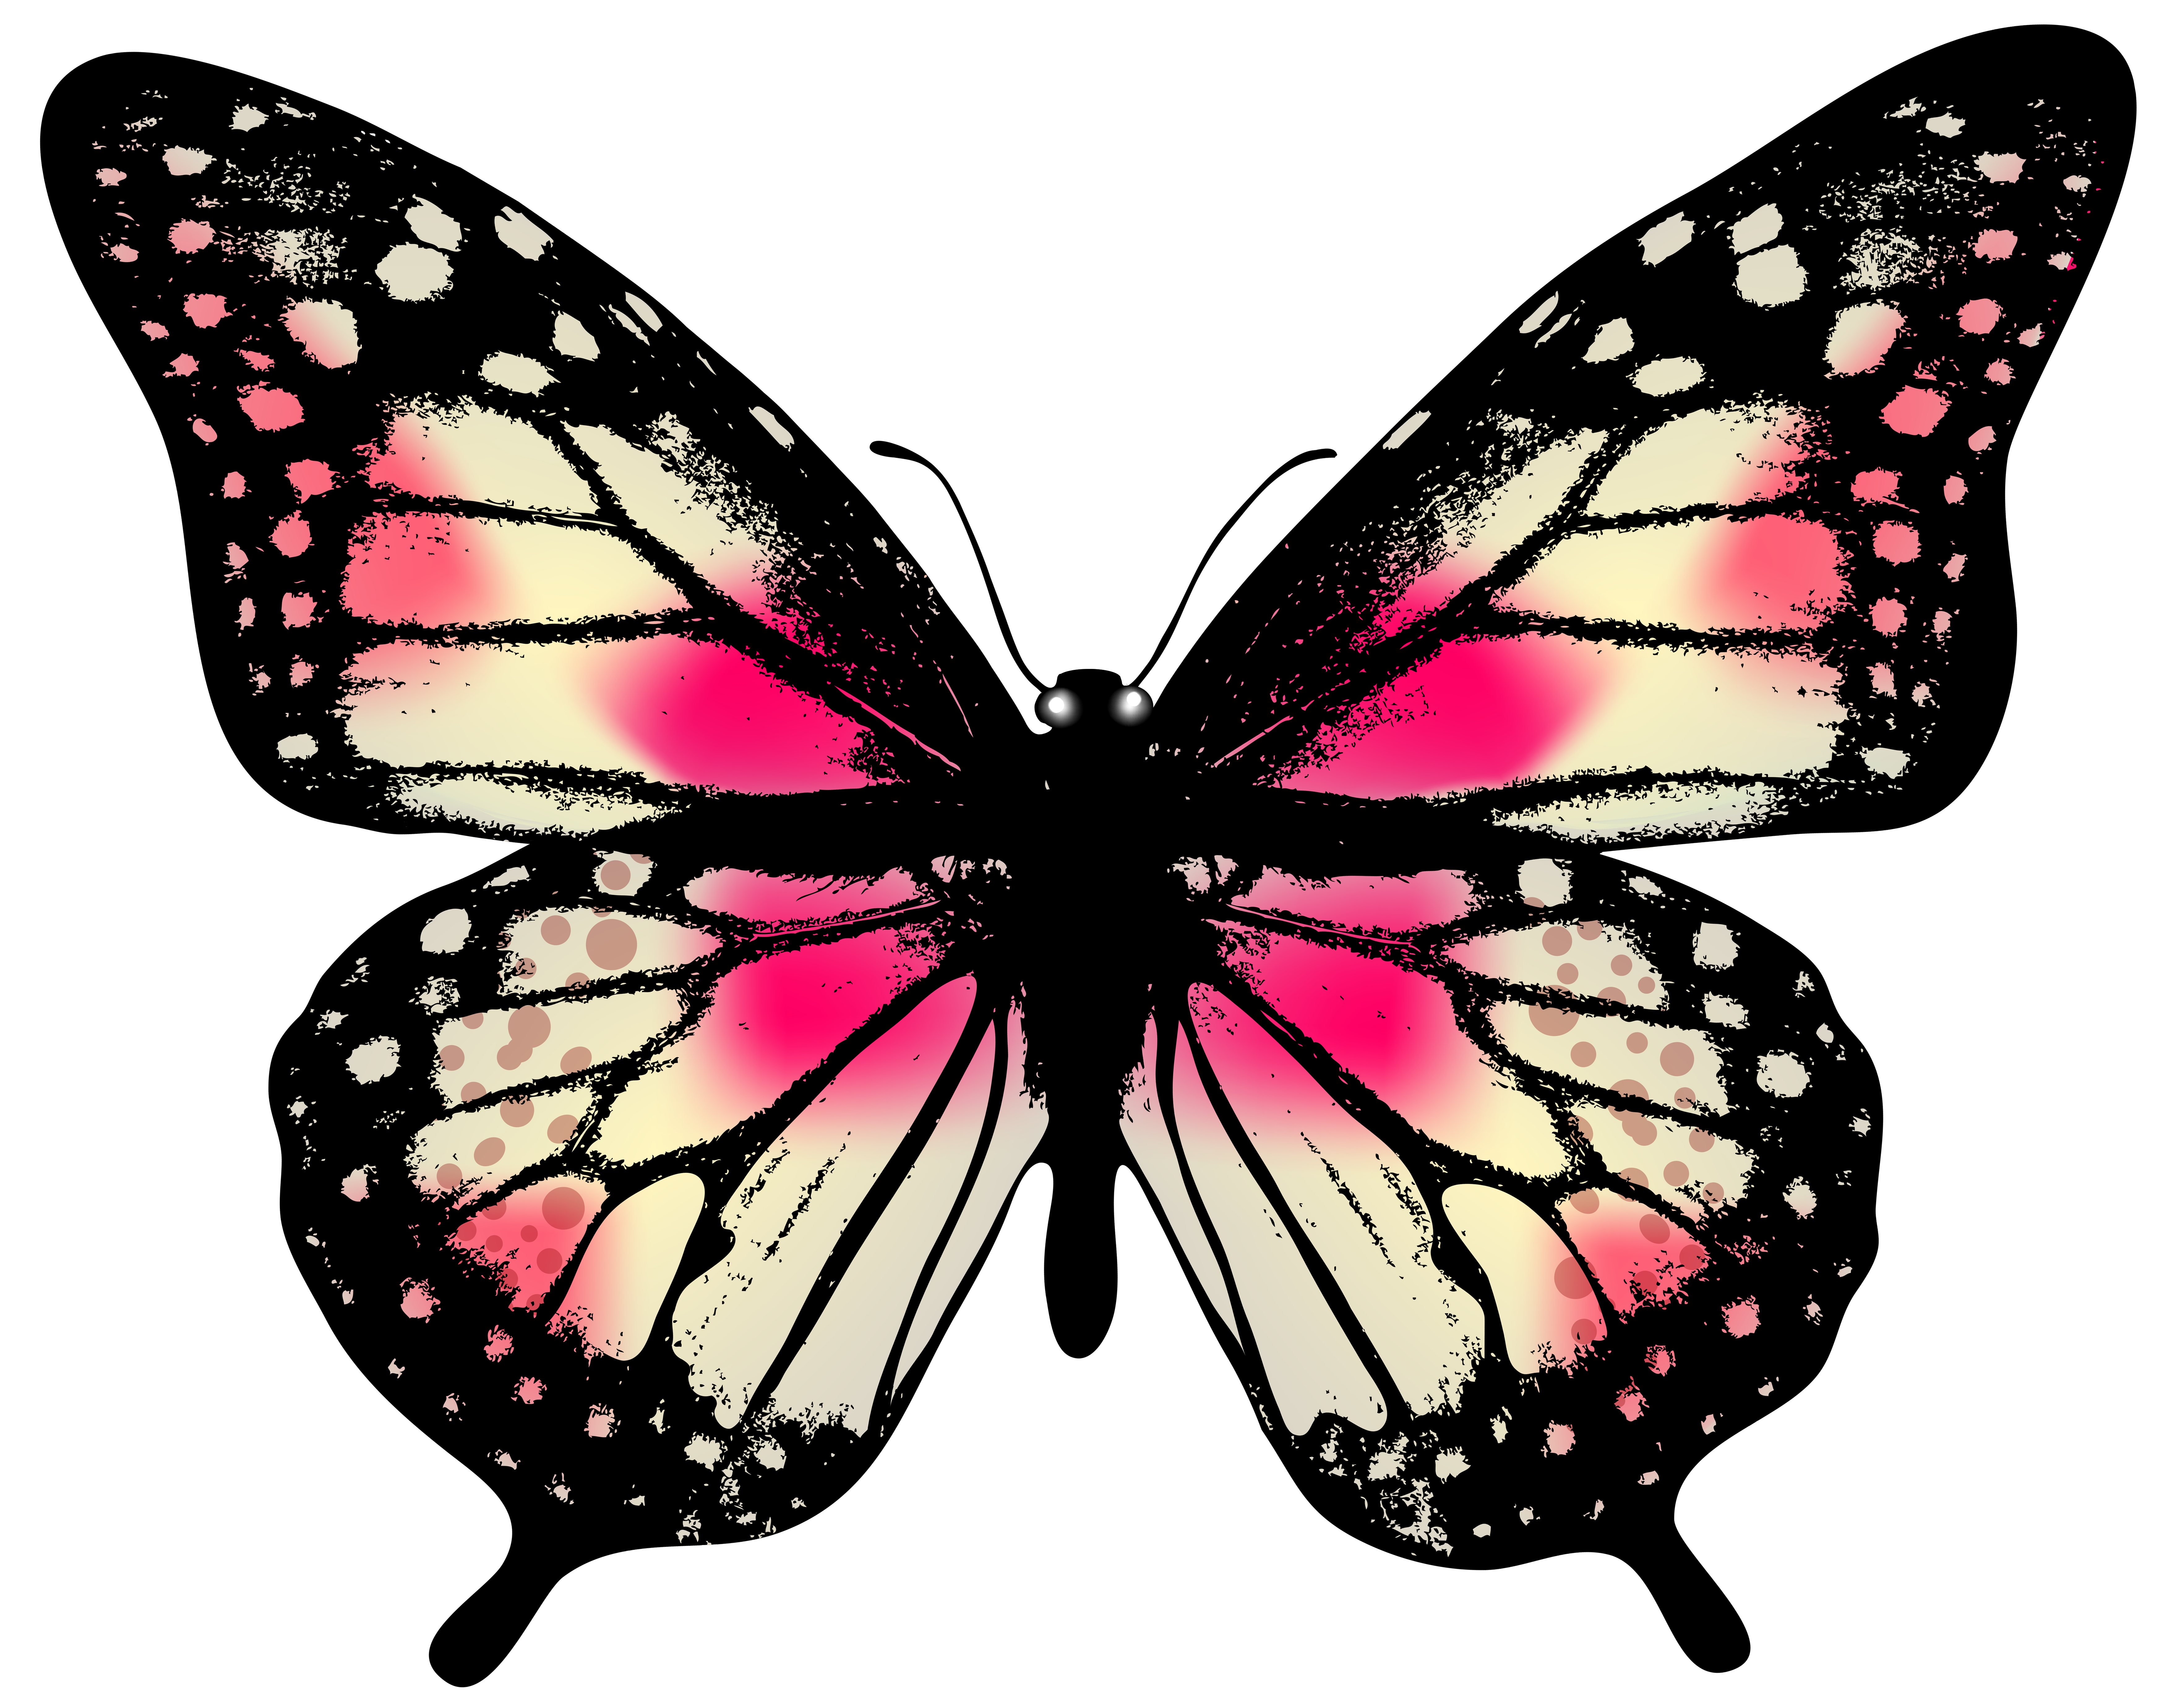 Открытку, бабочки рисунок на прозрачном фоне